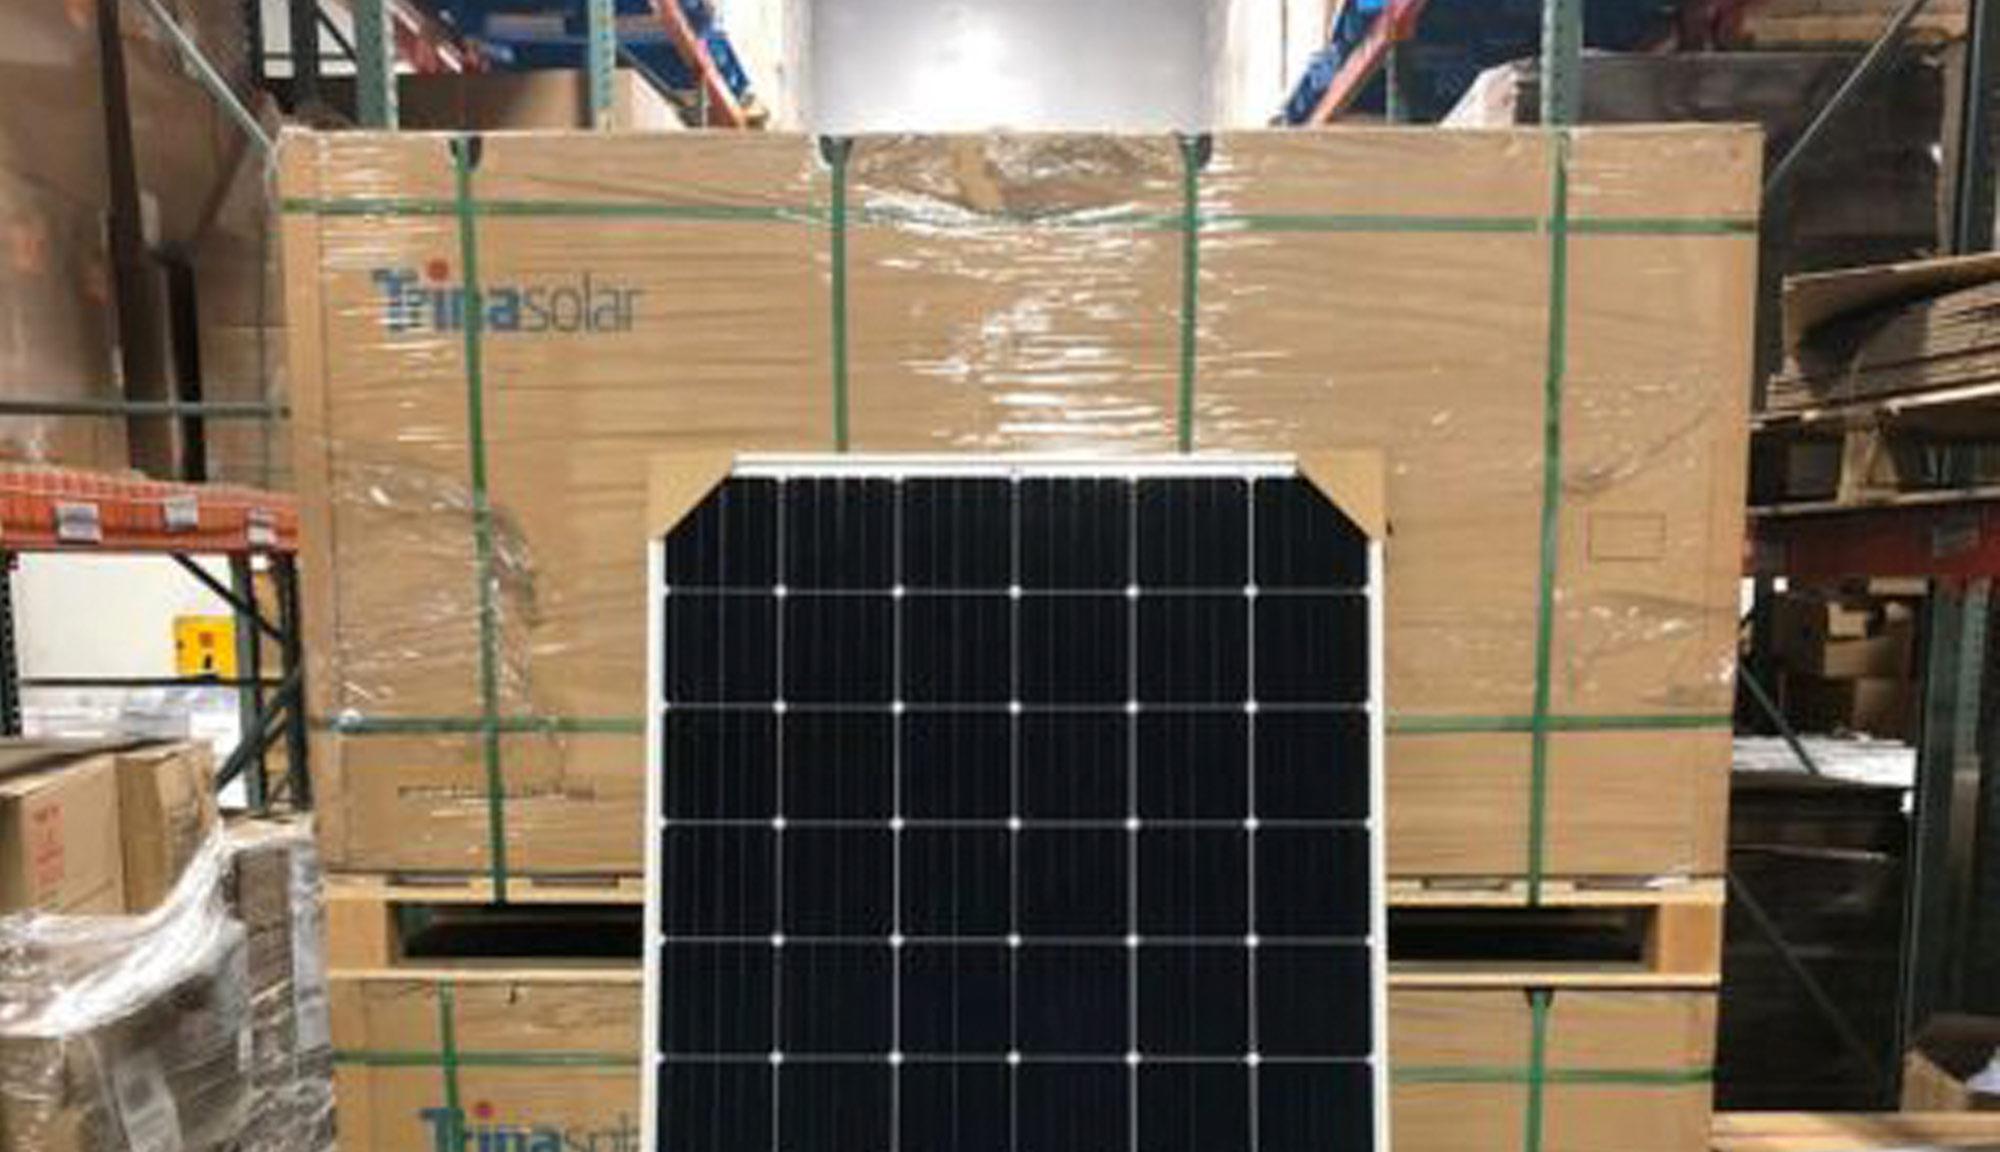 Venta almacen distribuidor paneles solares instalador kit solar Valladolid Segovia Ávila